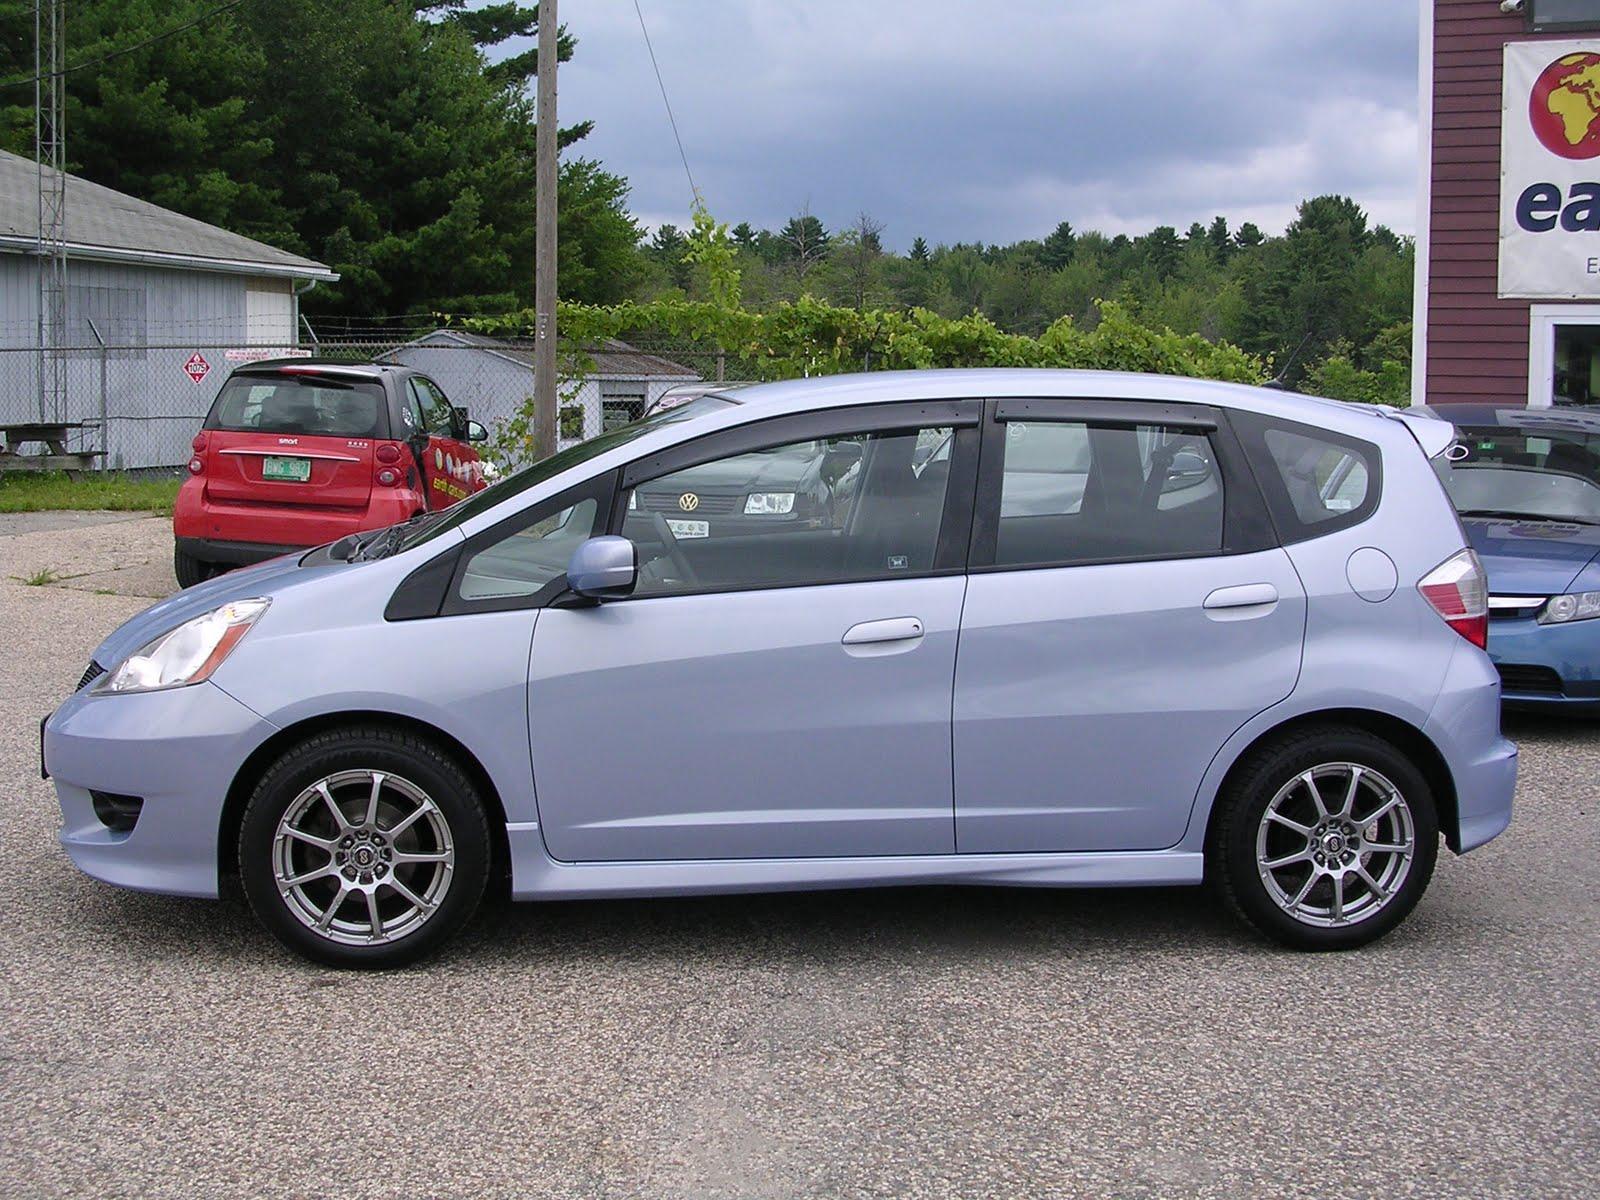 Earthy Cars Blog  October 2011